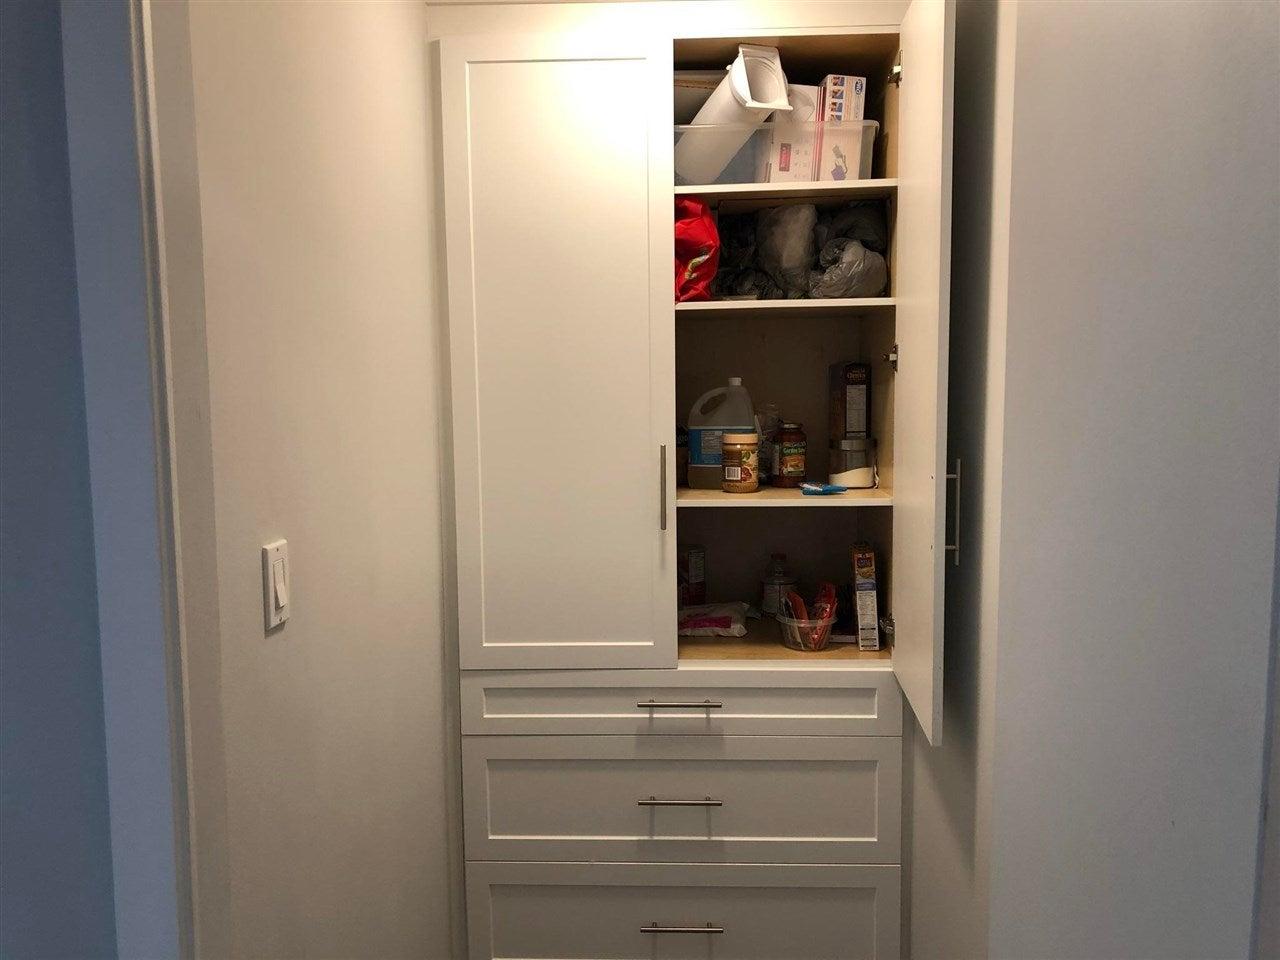 304 15238 100 AVENUE - Guildford Apartment/Condo for sale, 1 Bedroom (R2576105) - #17